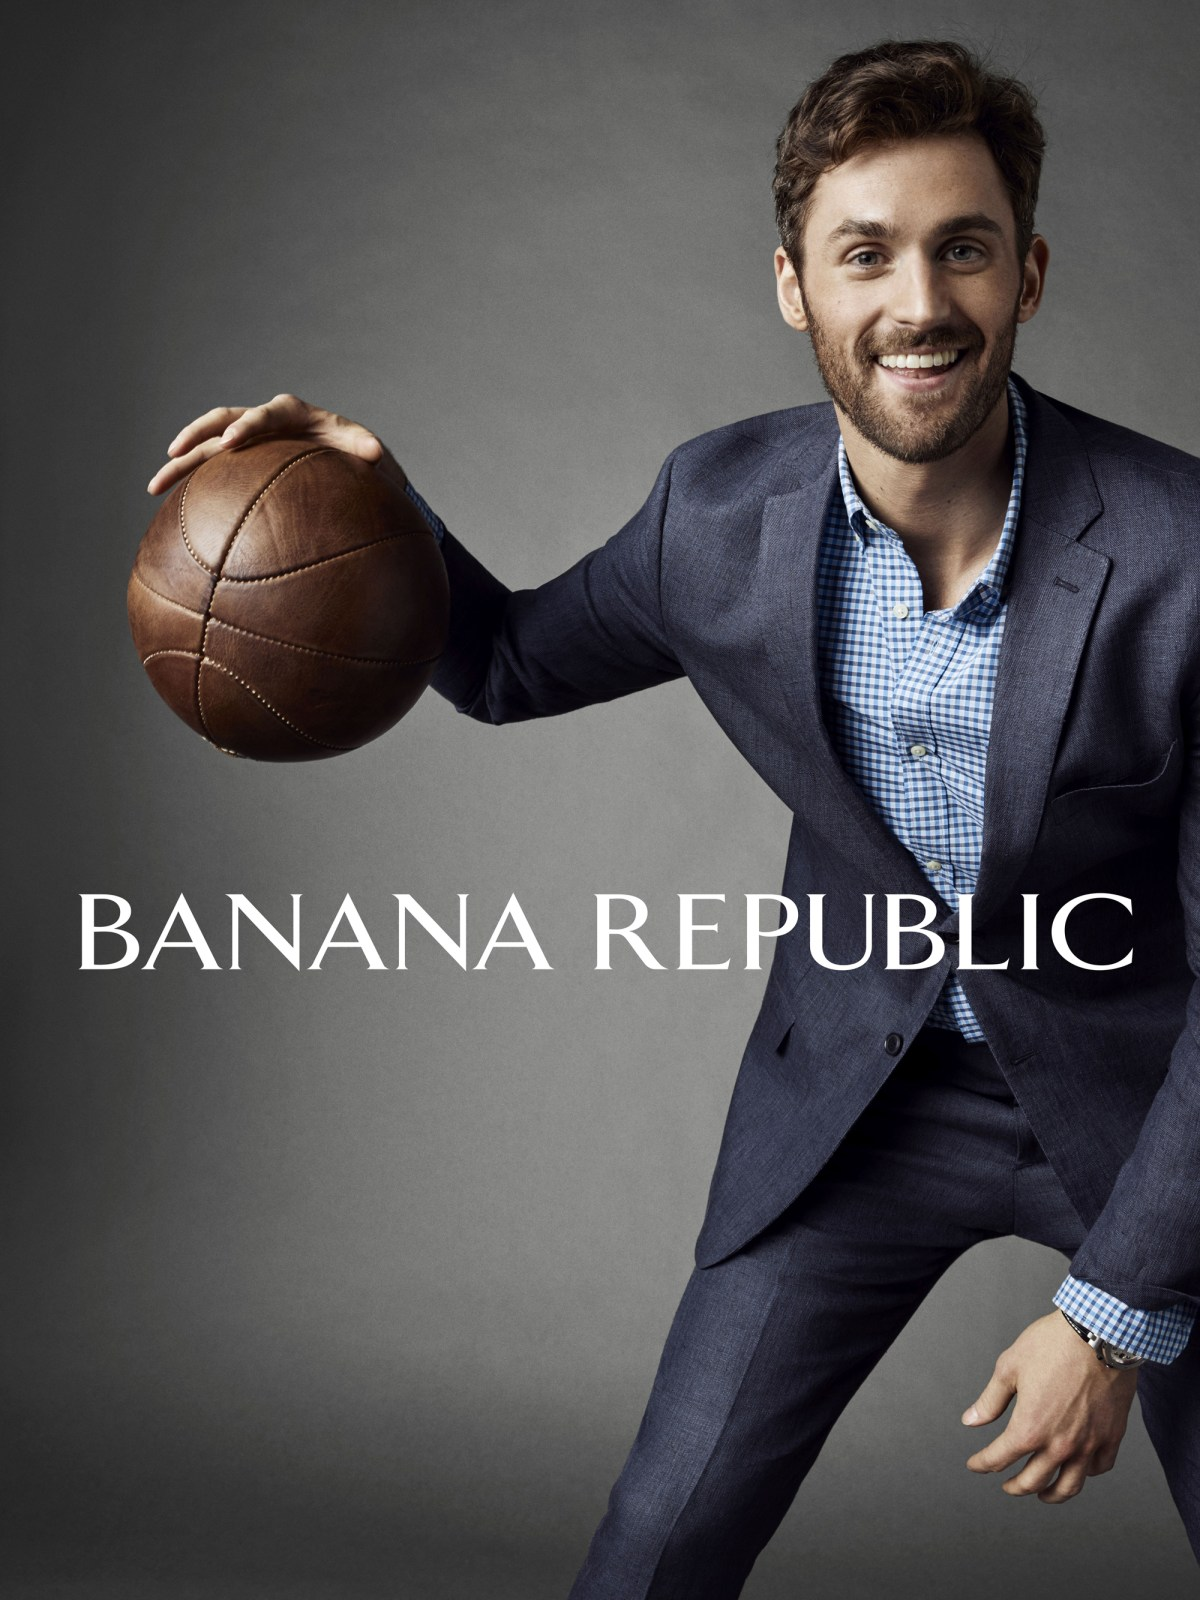 Banana-Republic-summer-ad-campaign-